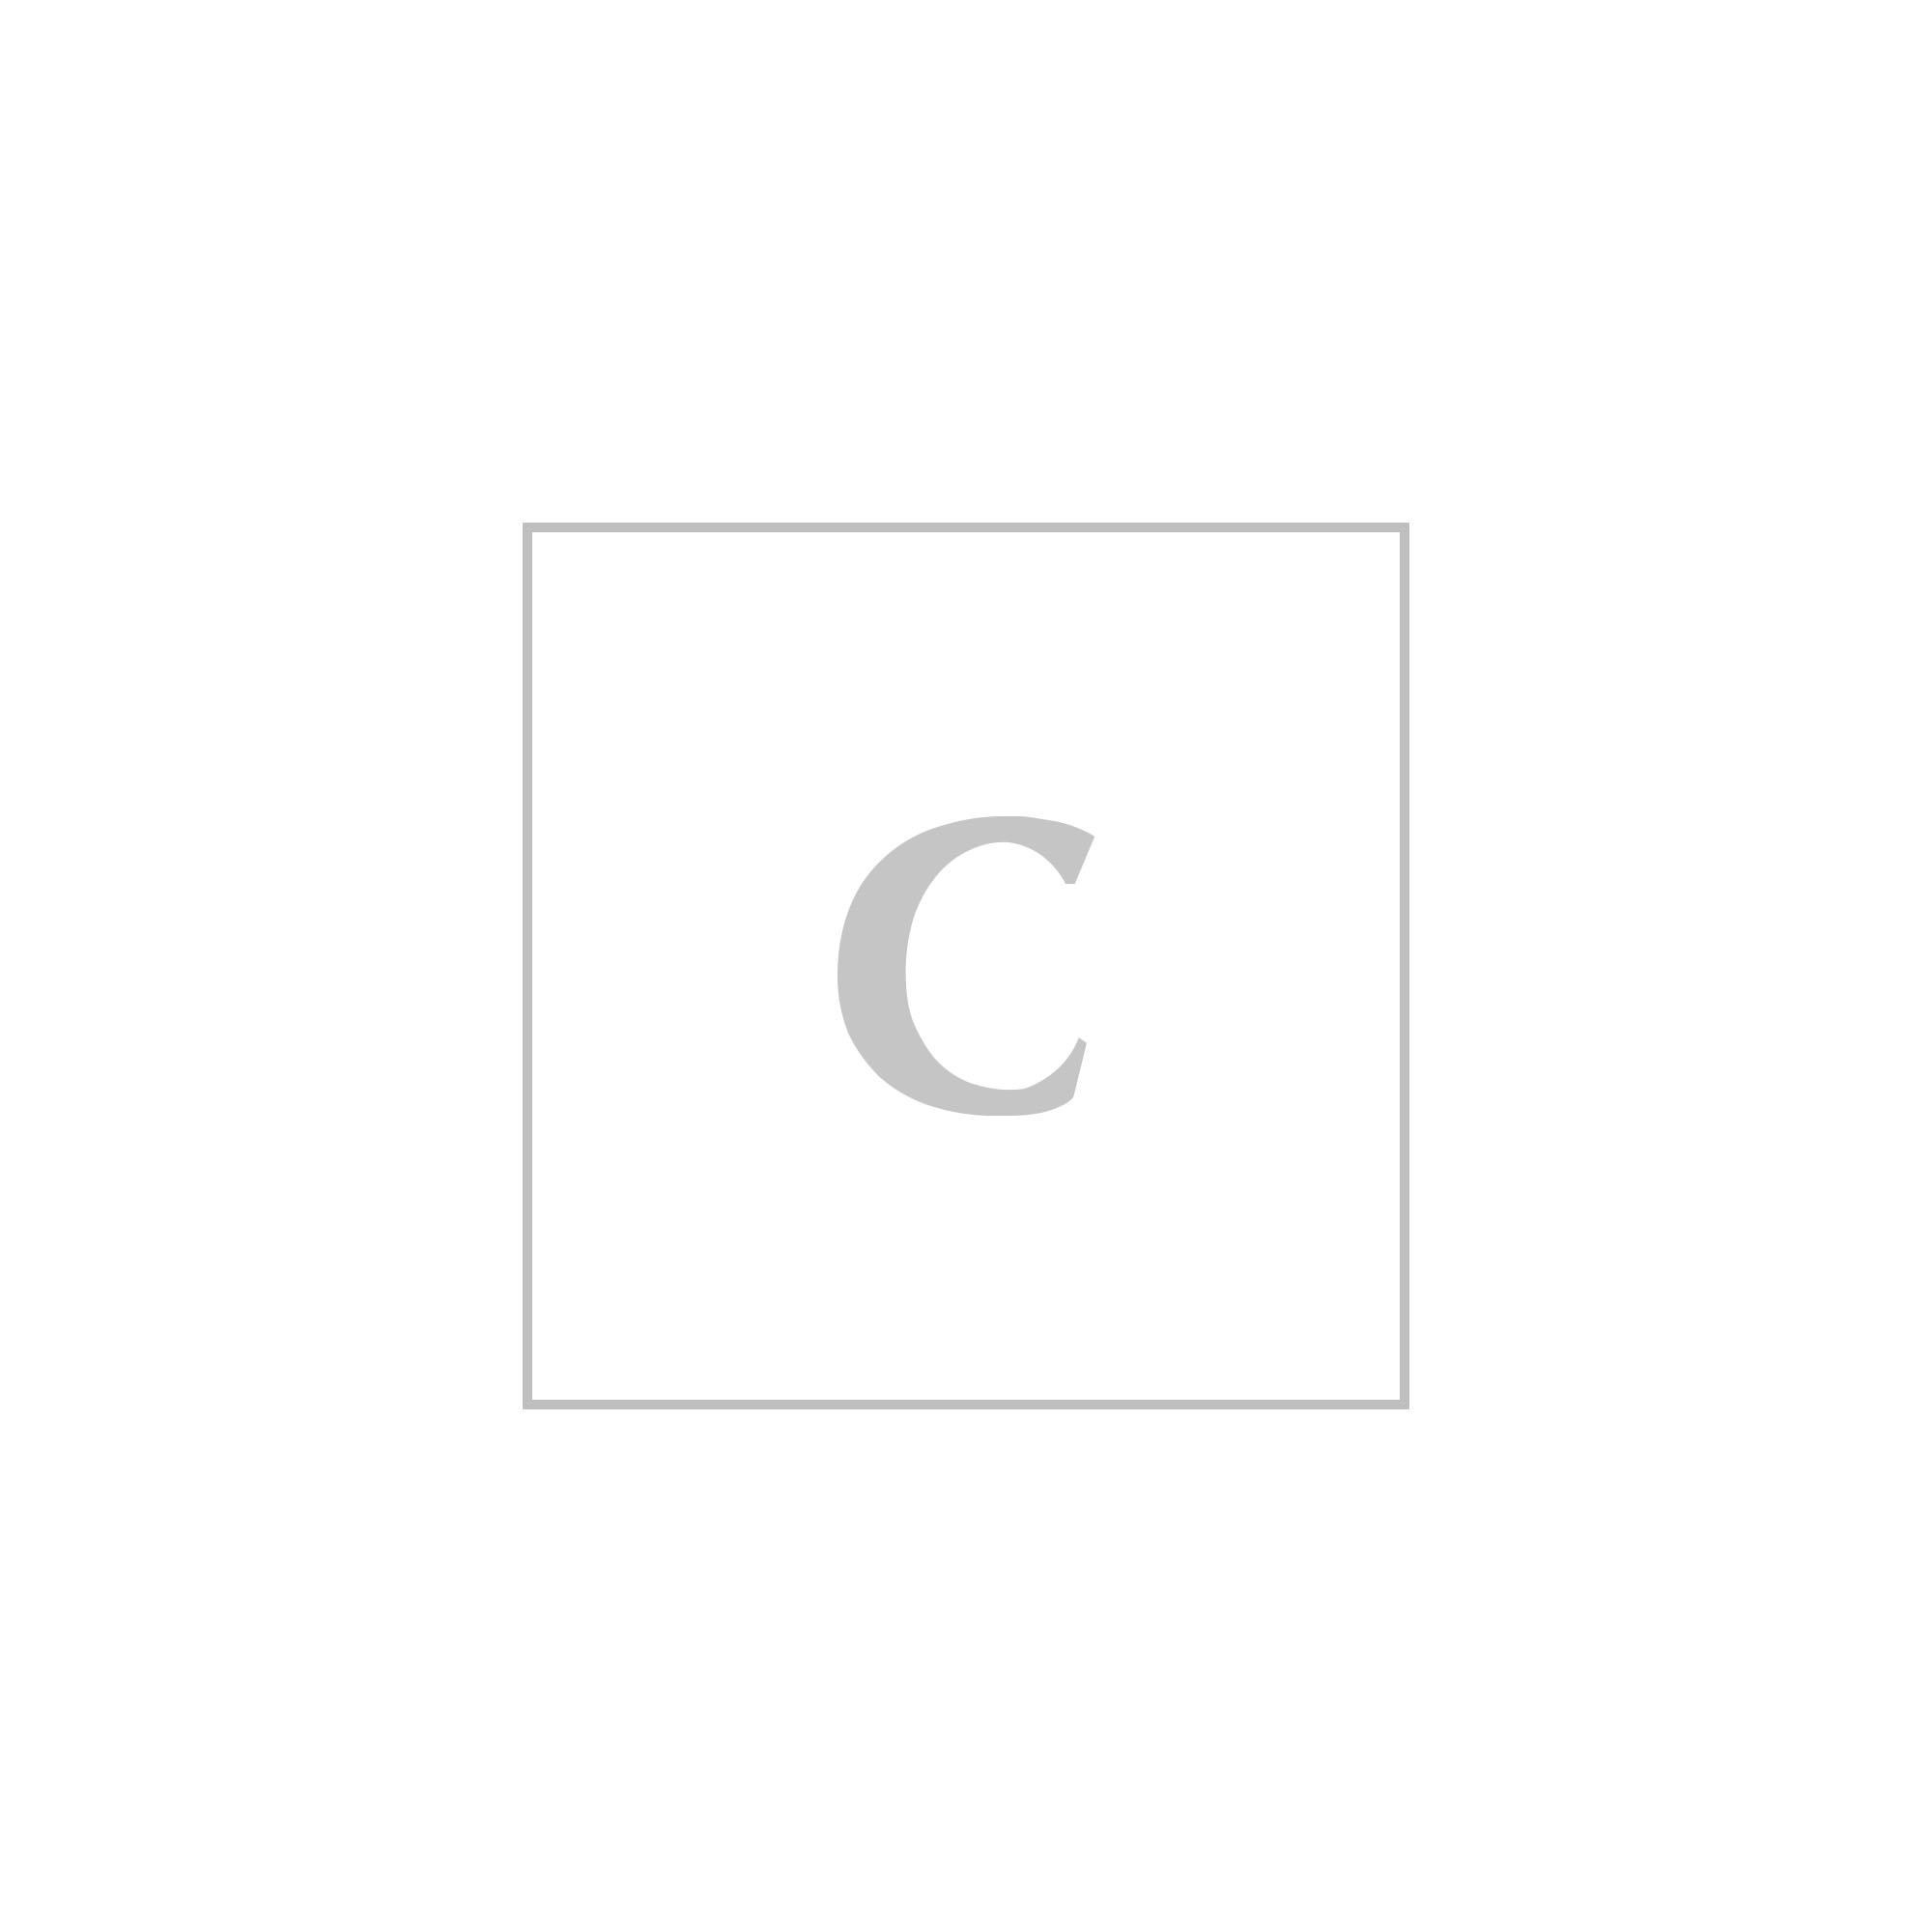 Burberry giaccone tunbridge